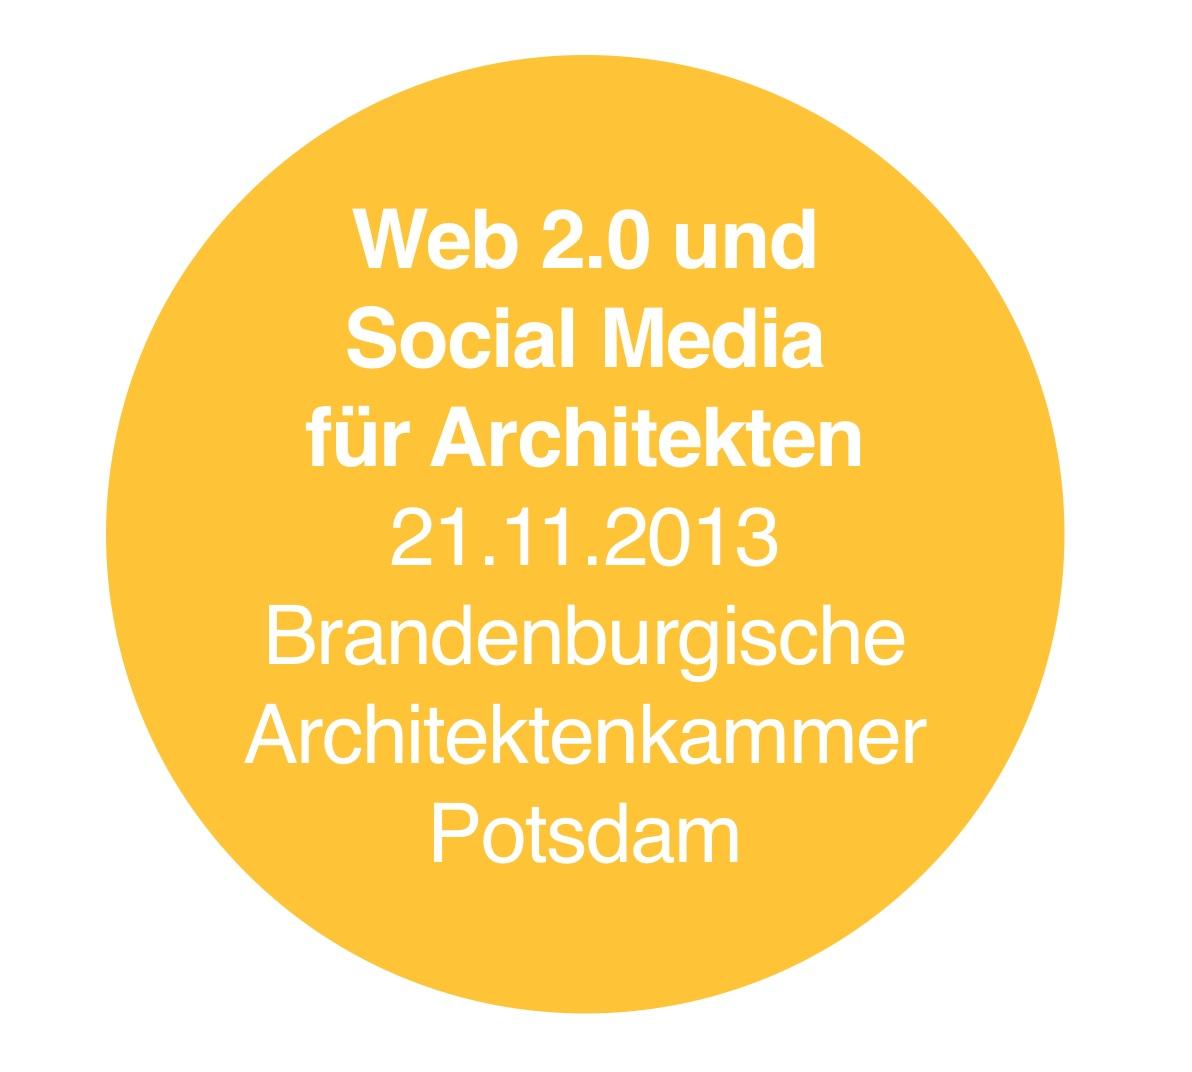 seminar-social-media-web-2-0-potsdam-architekten-eric-sturm.jpg